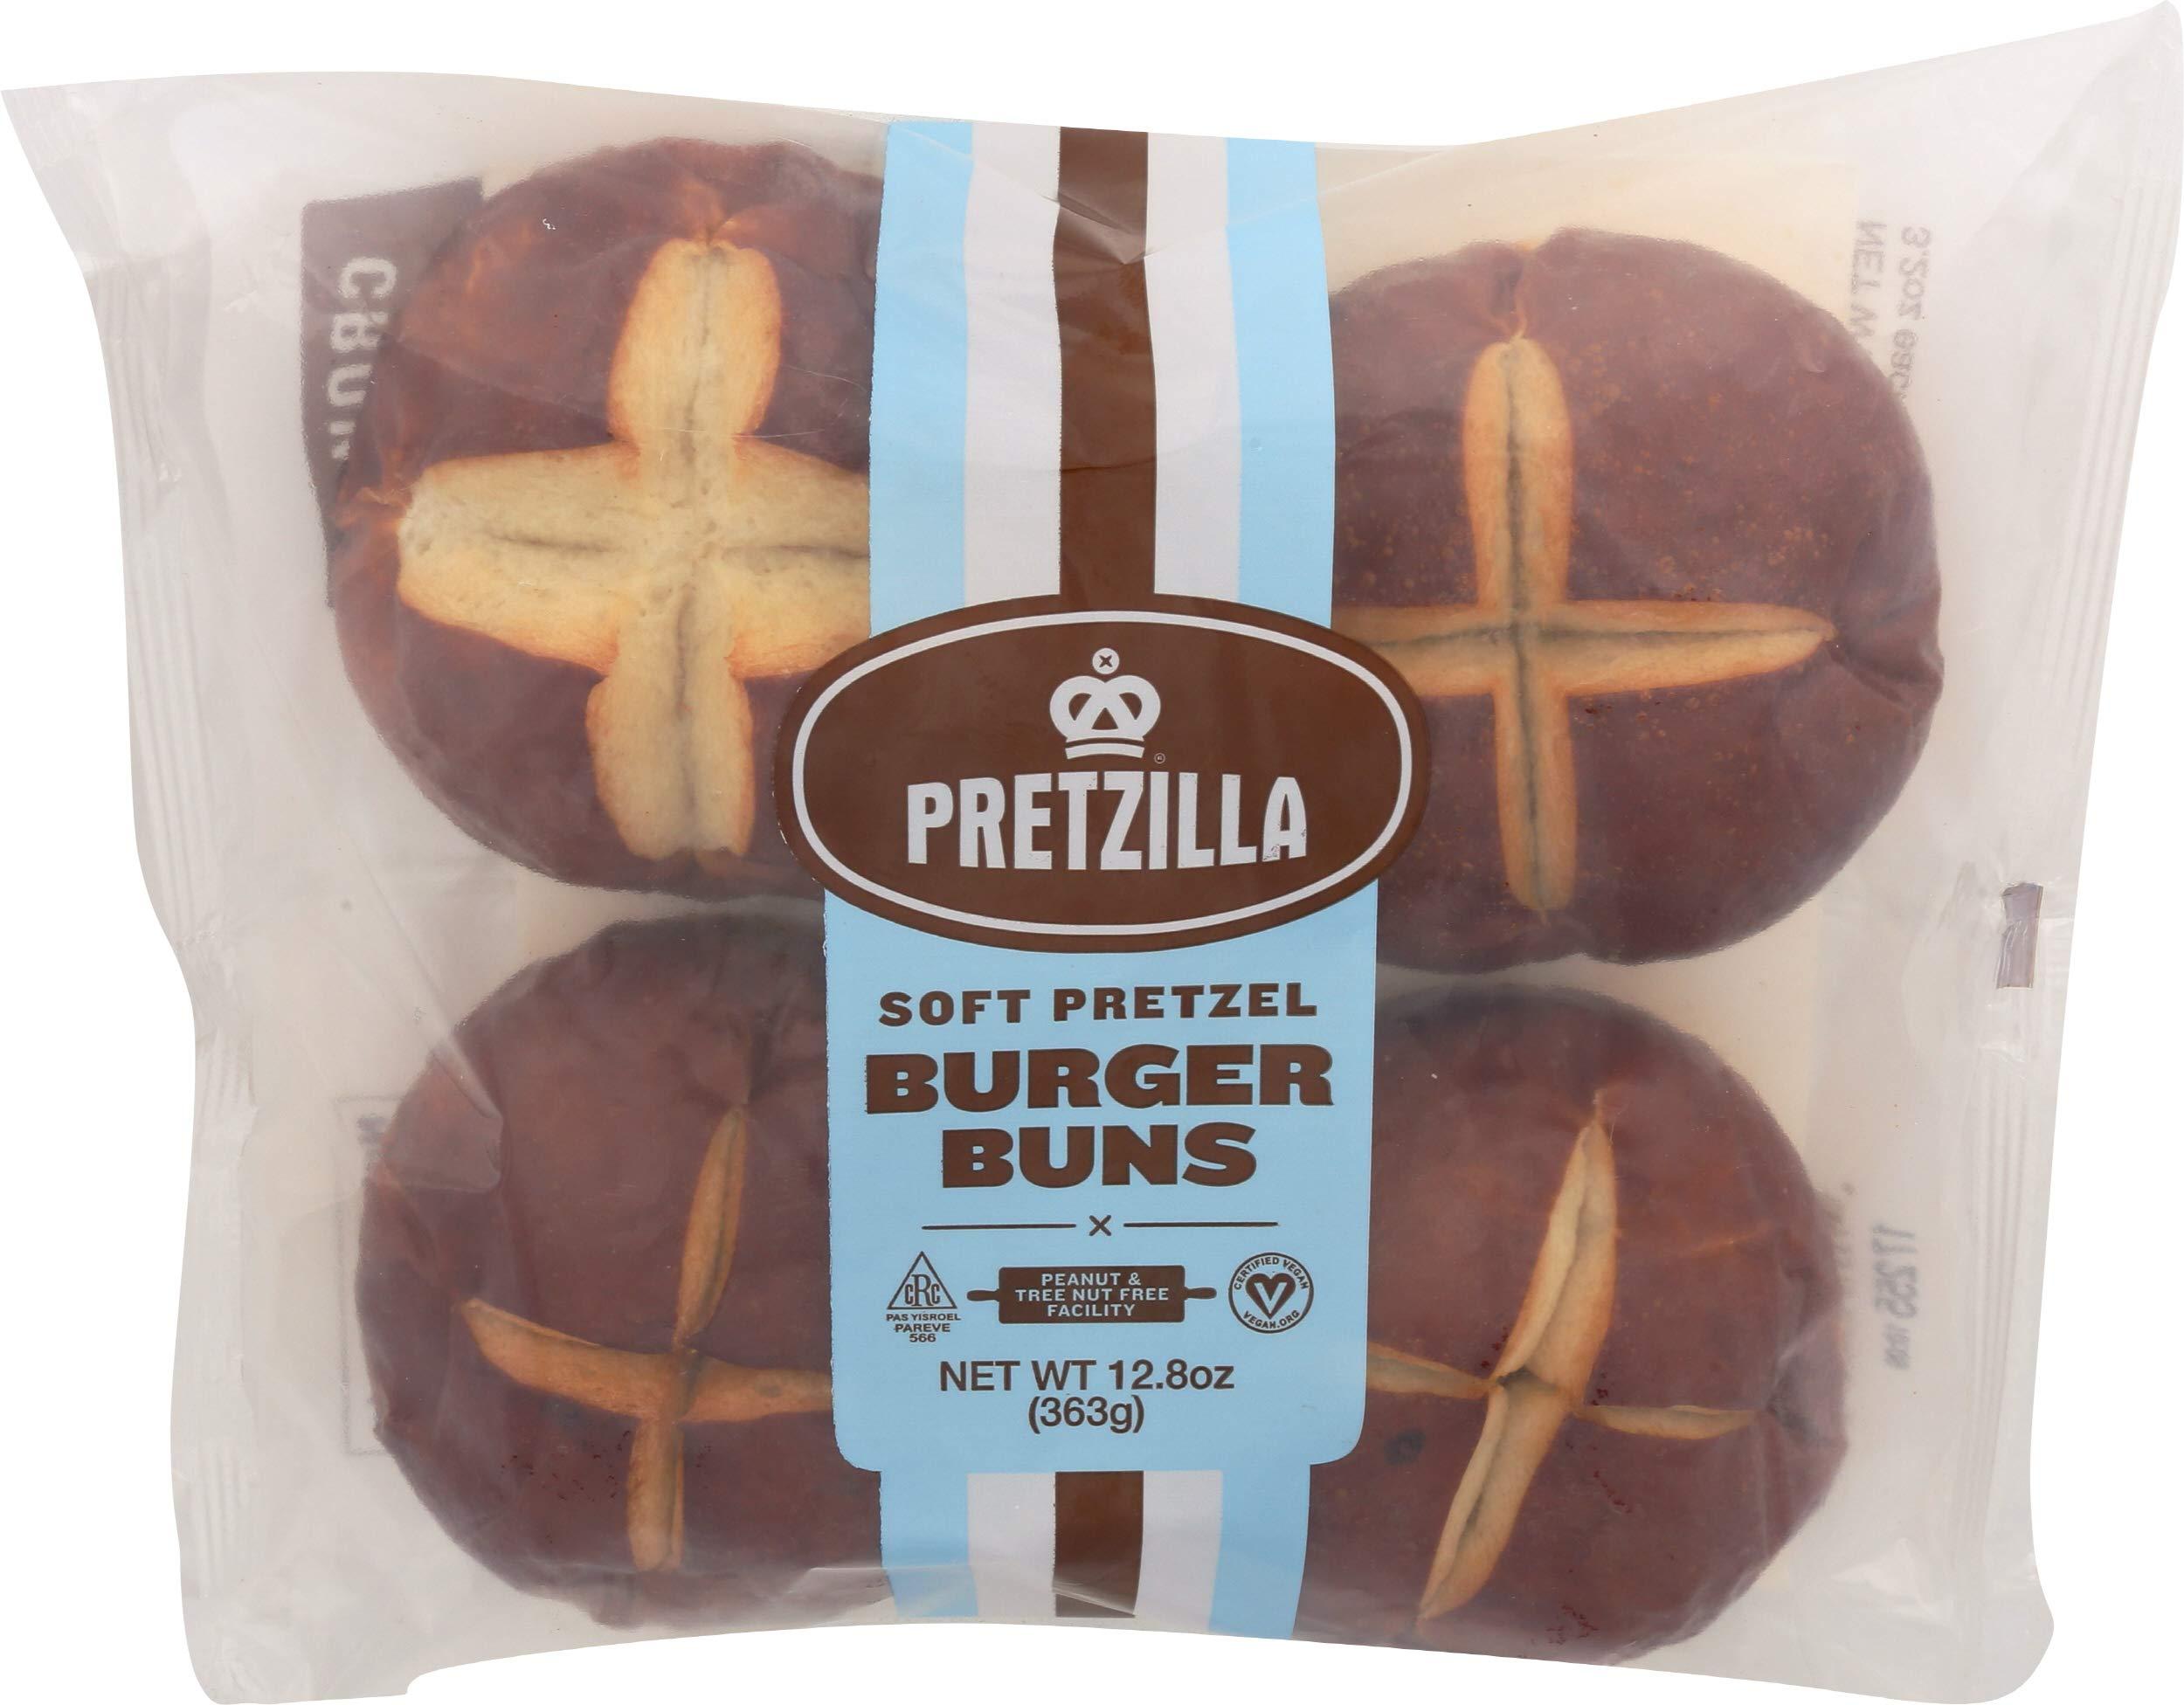 PRETZILLA Frozen Pretzel, Burger Bun, 12.8 Ounce (Pack of 15)